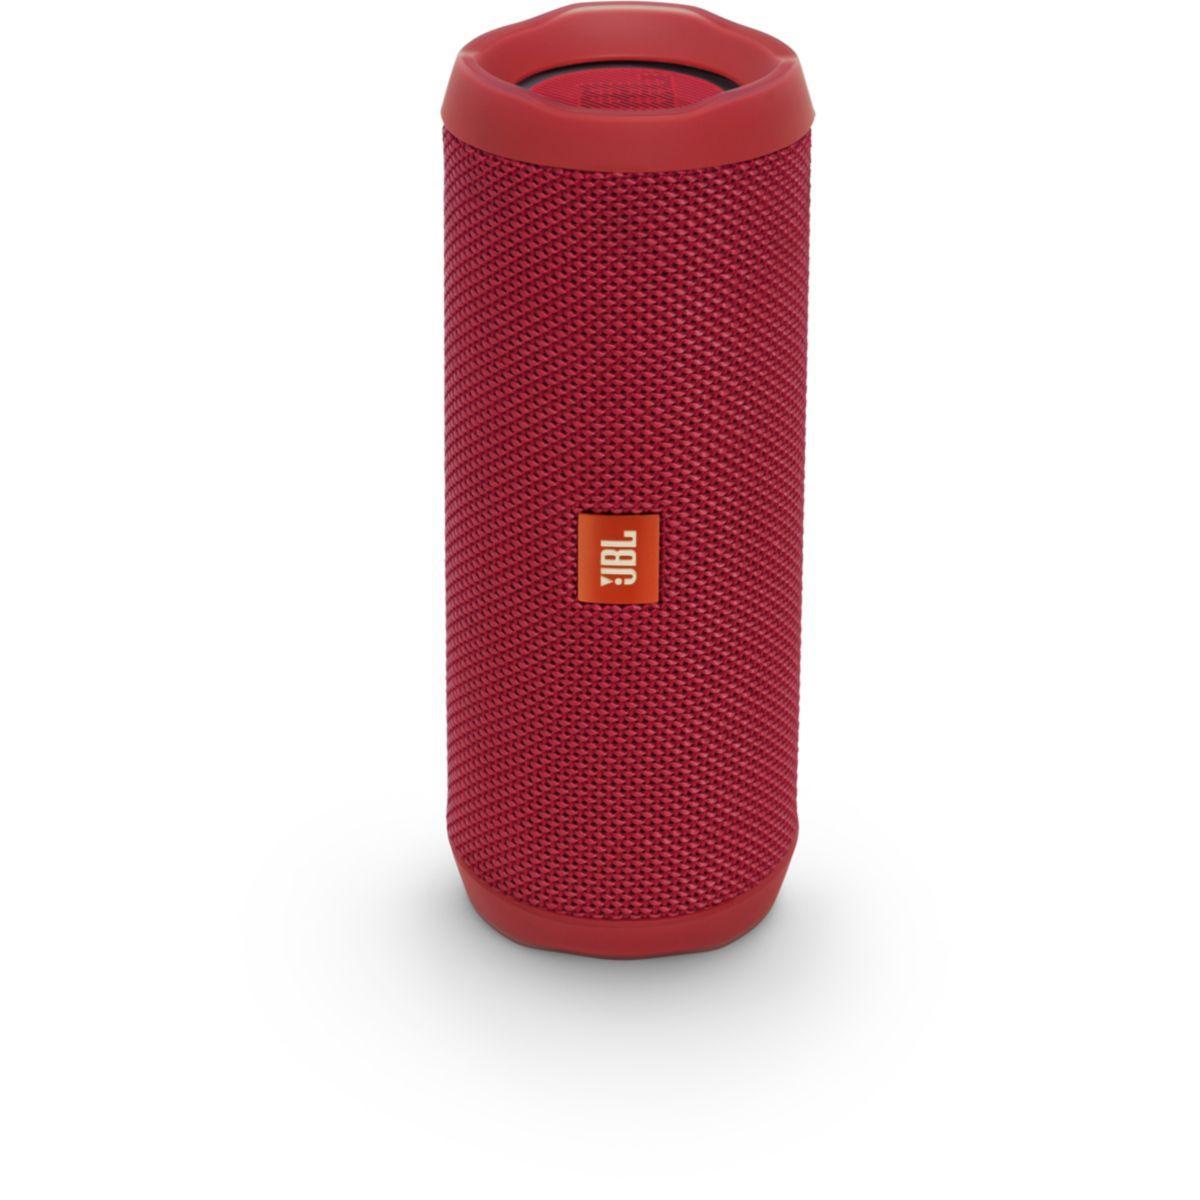 Enceinte bluetooth jbl flip 4 rouge - livraison offerte : code premium (photo)